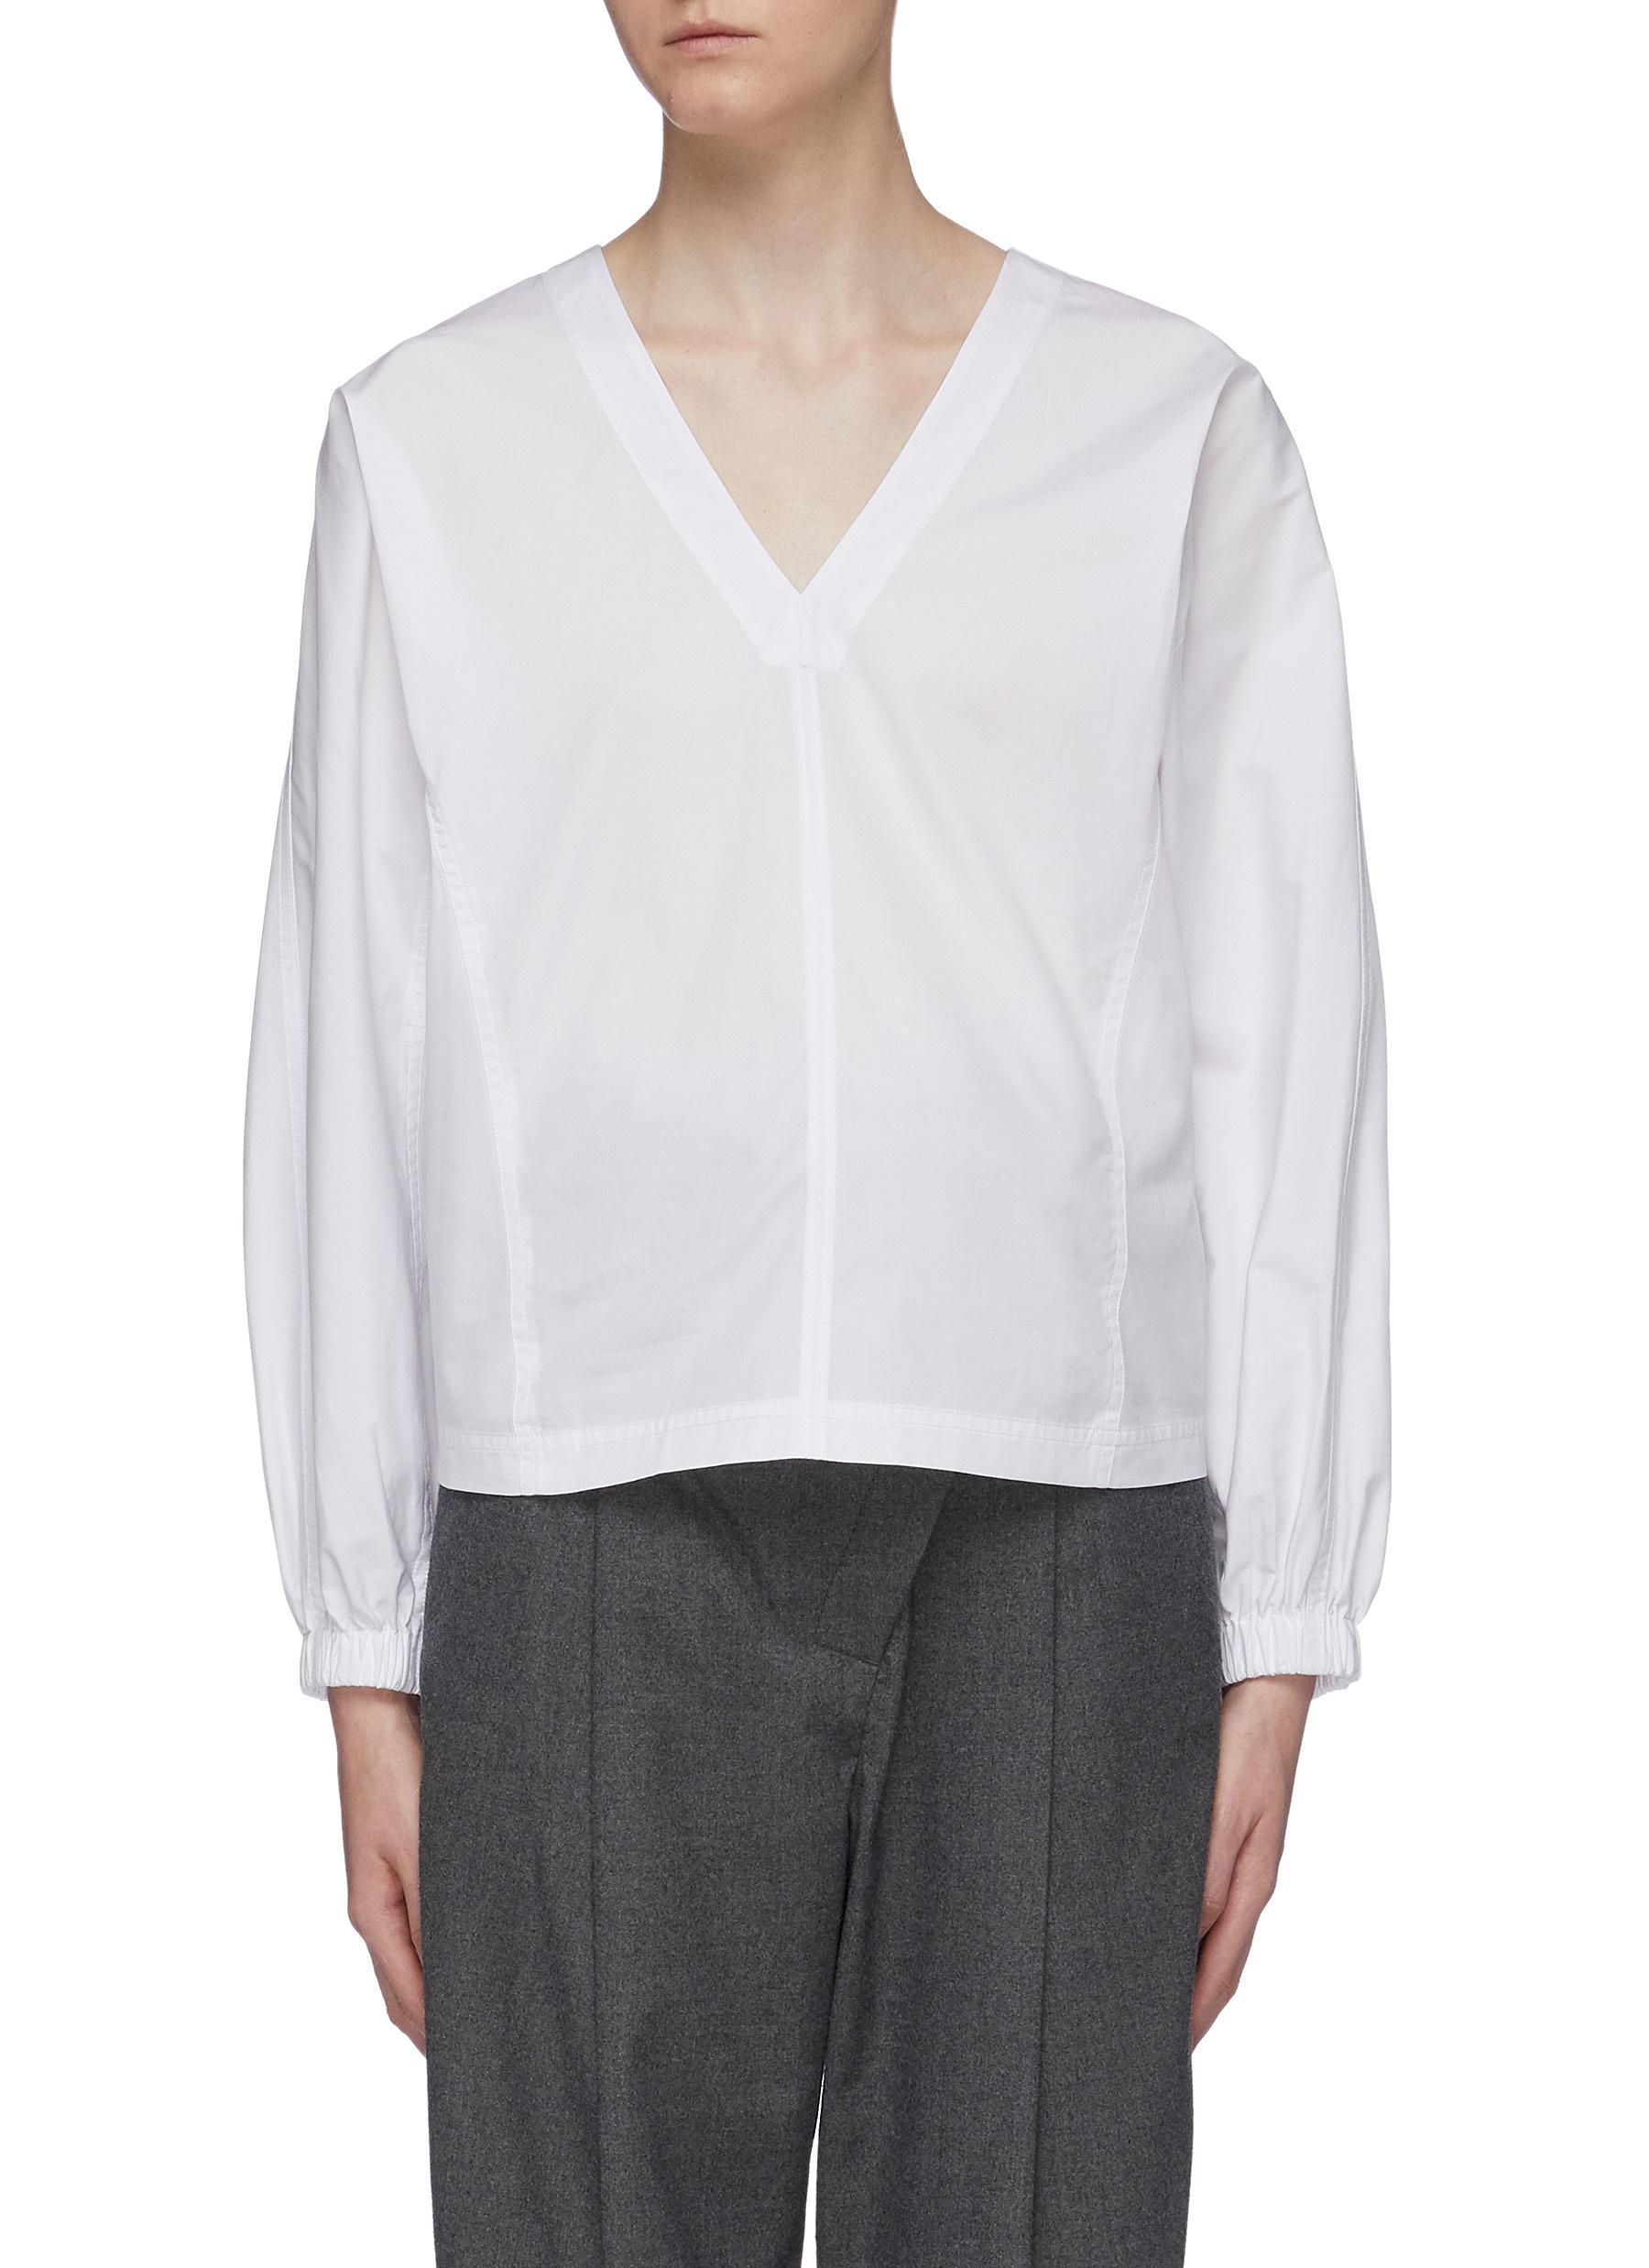 Balloon sleeve V-neck poplin blouse by 3.1 Phillip Lim